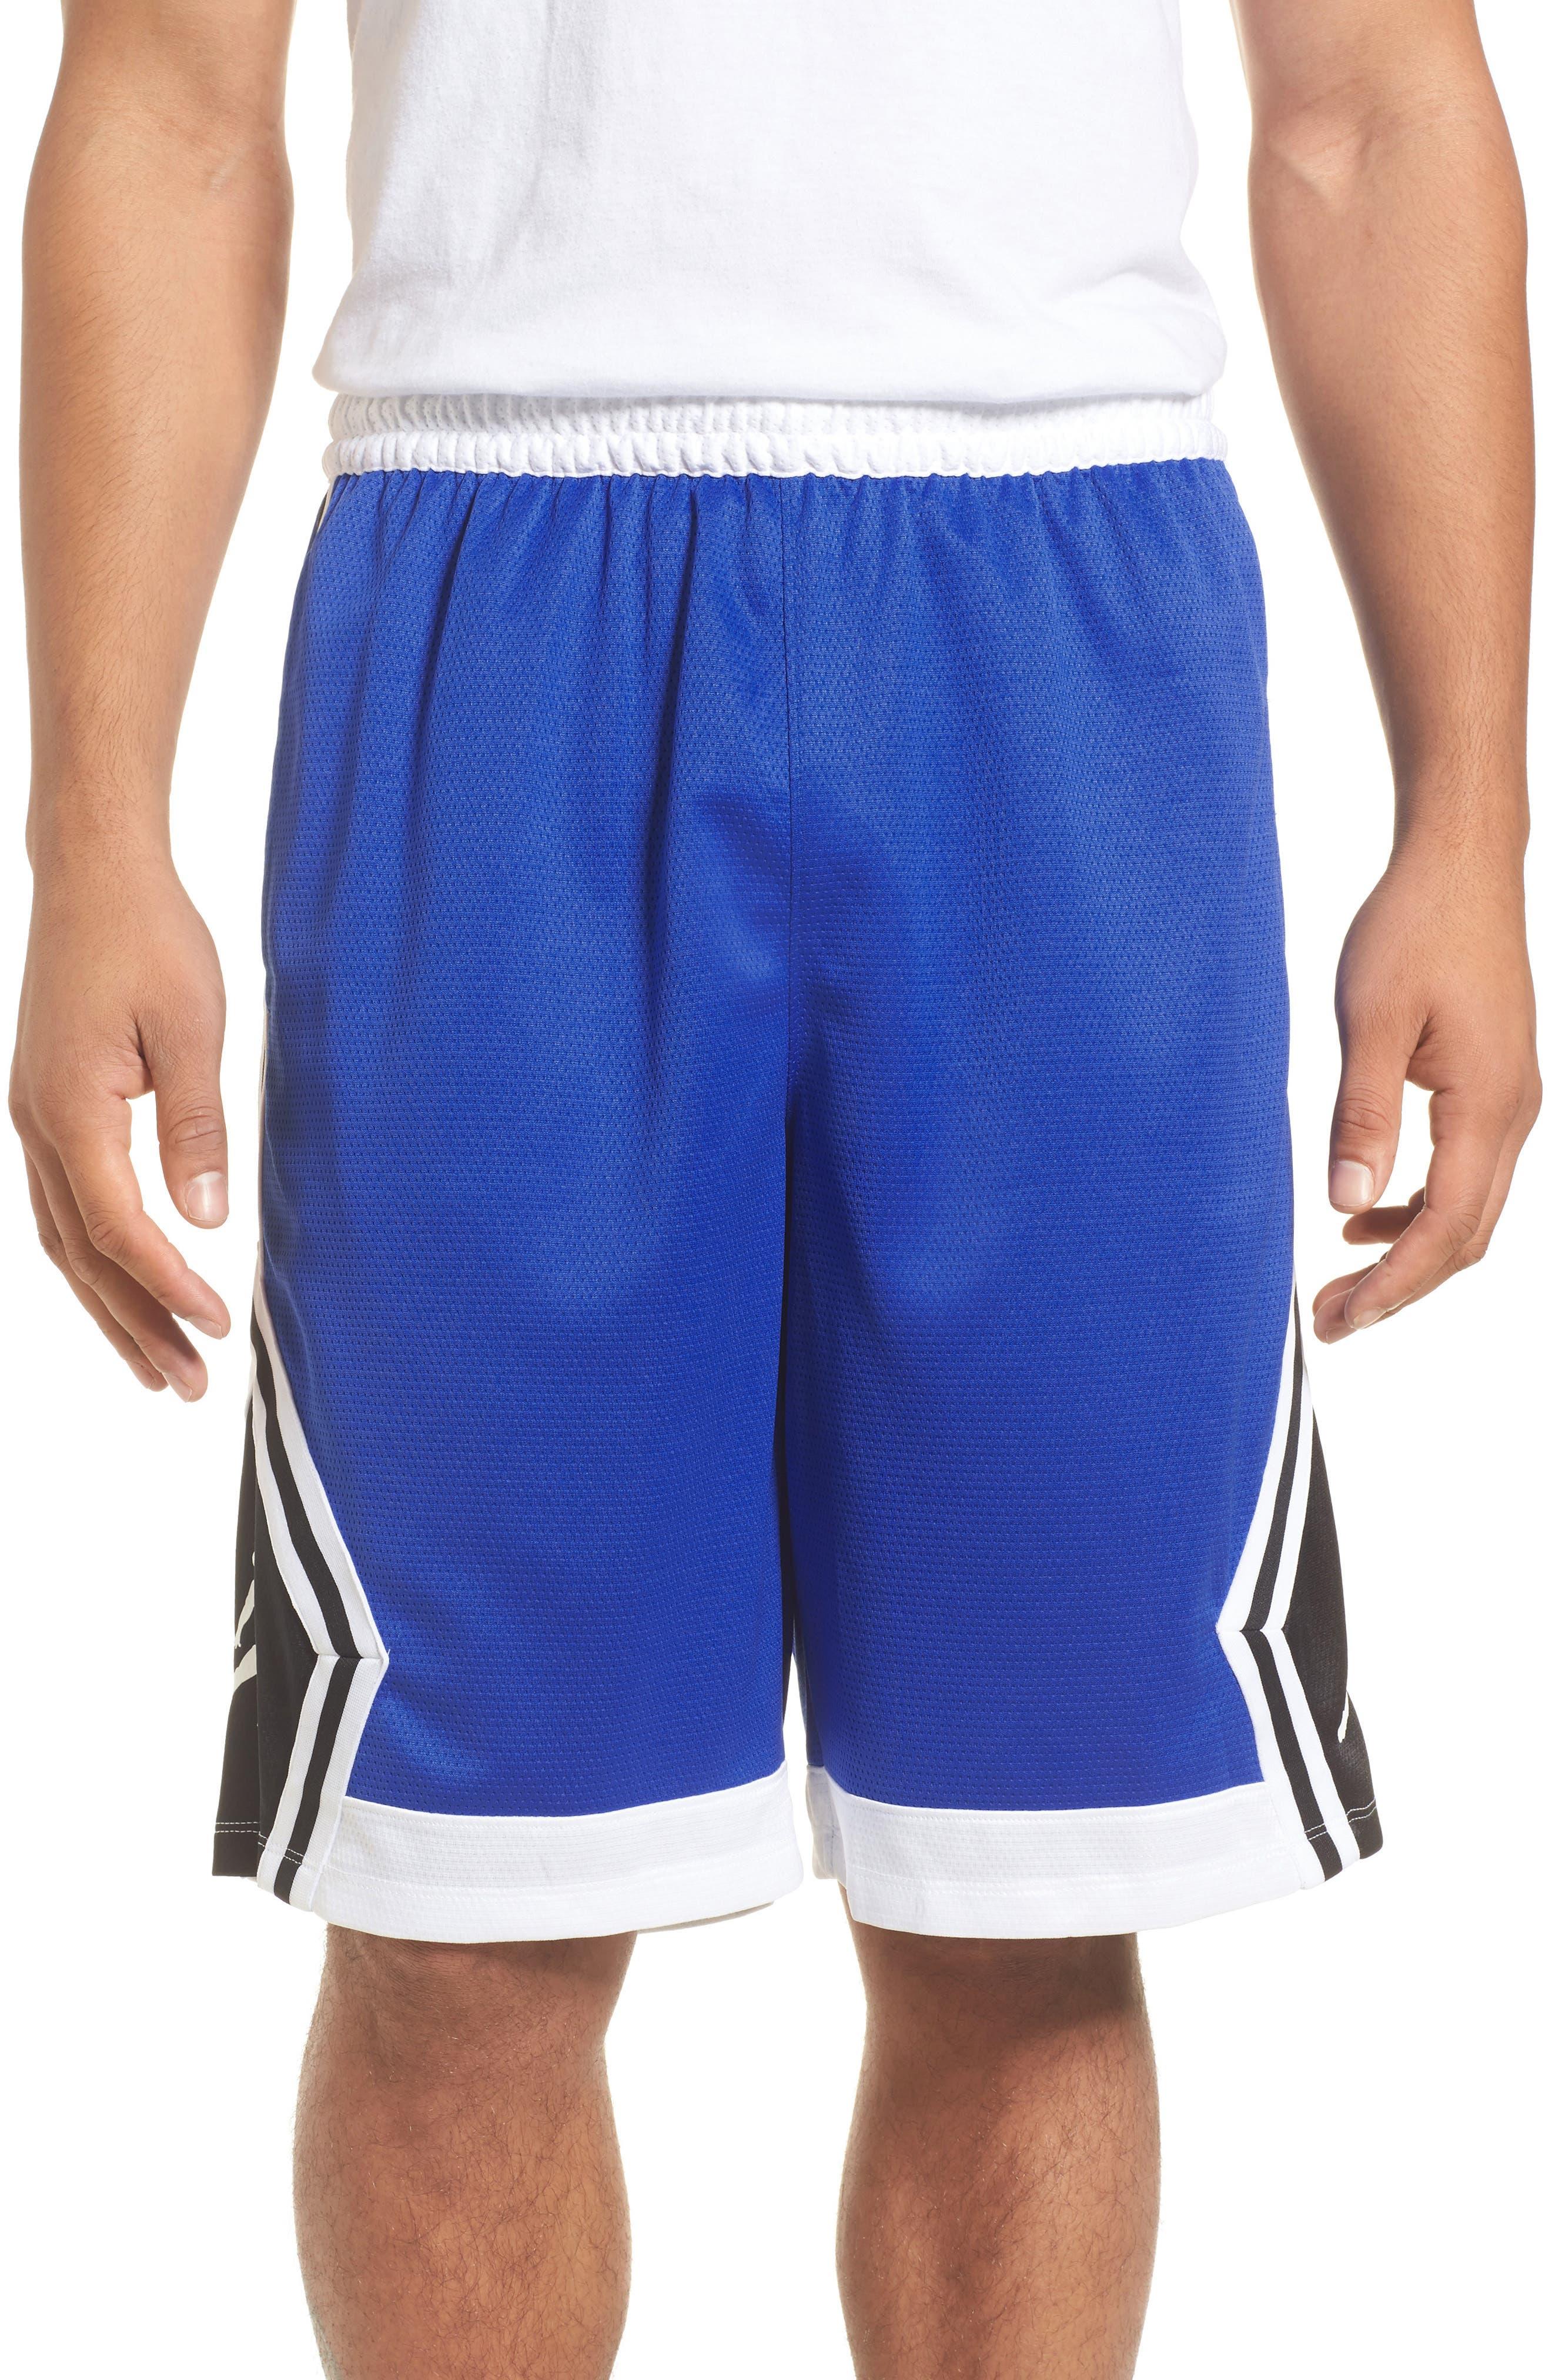 Sportswear Rise Diamond Shorts,                         Main,                         color, Hyper Royal/ White/ Black